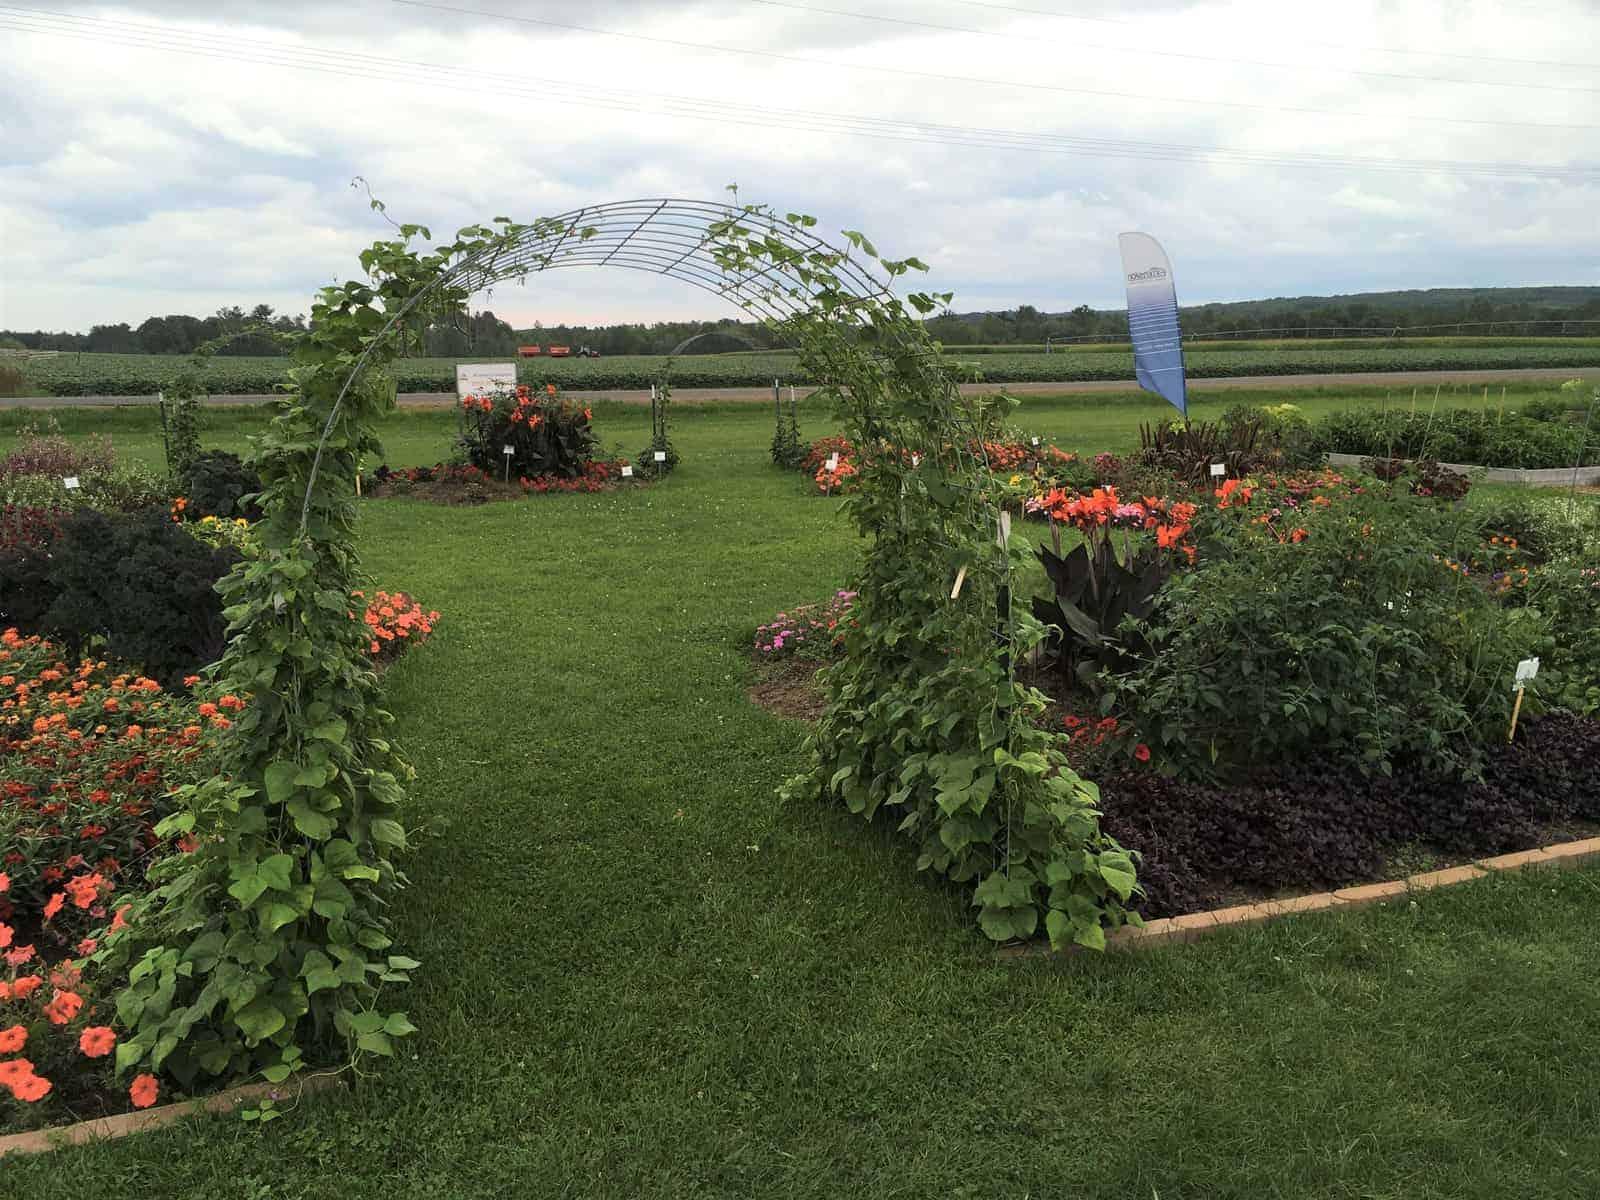 Evansville Farm Garden Services Craigslist Autocars Blog